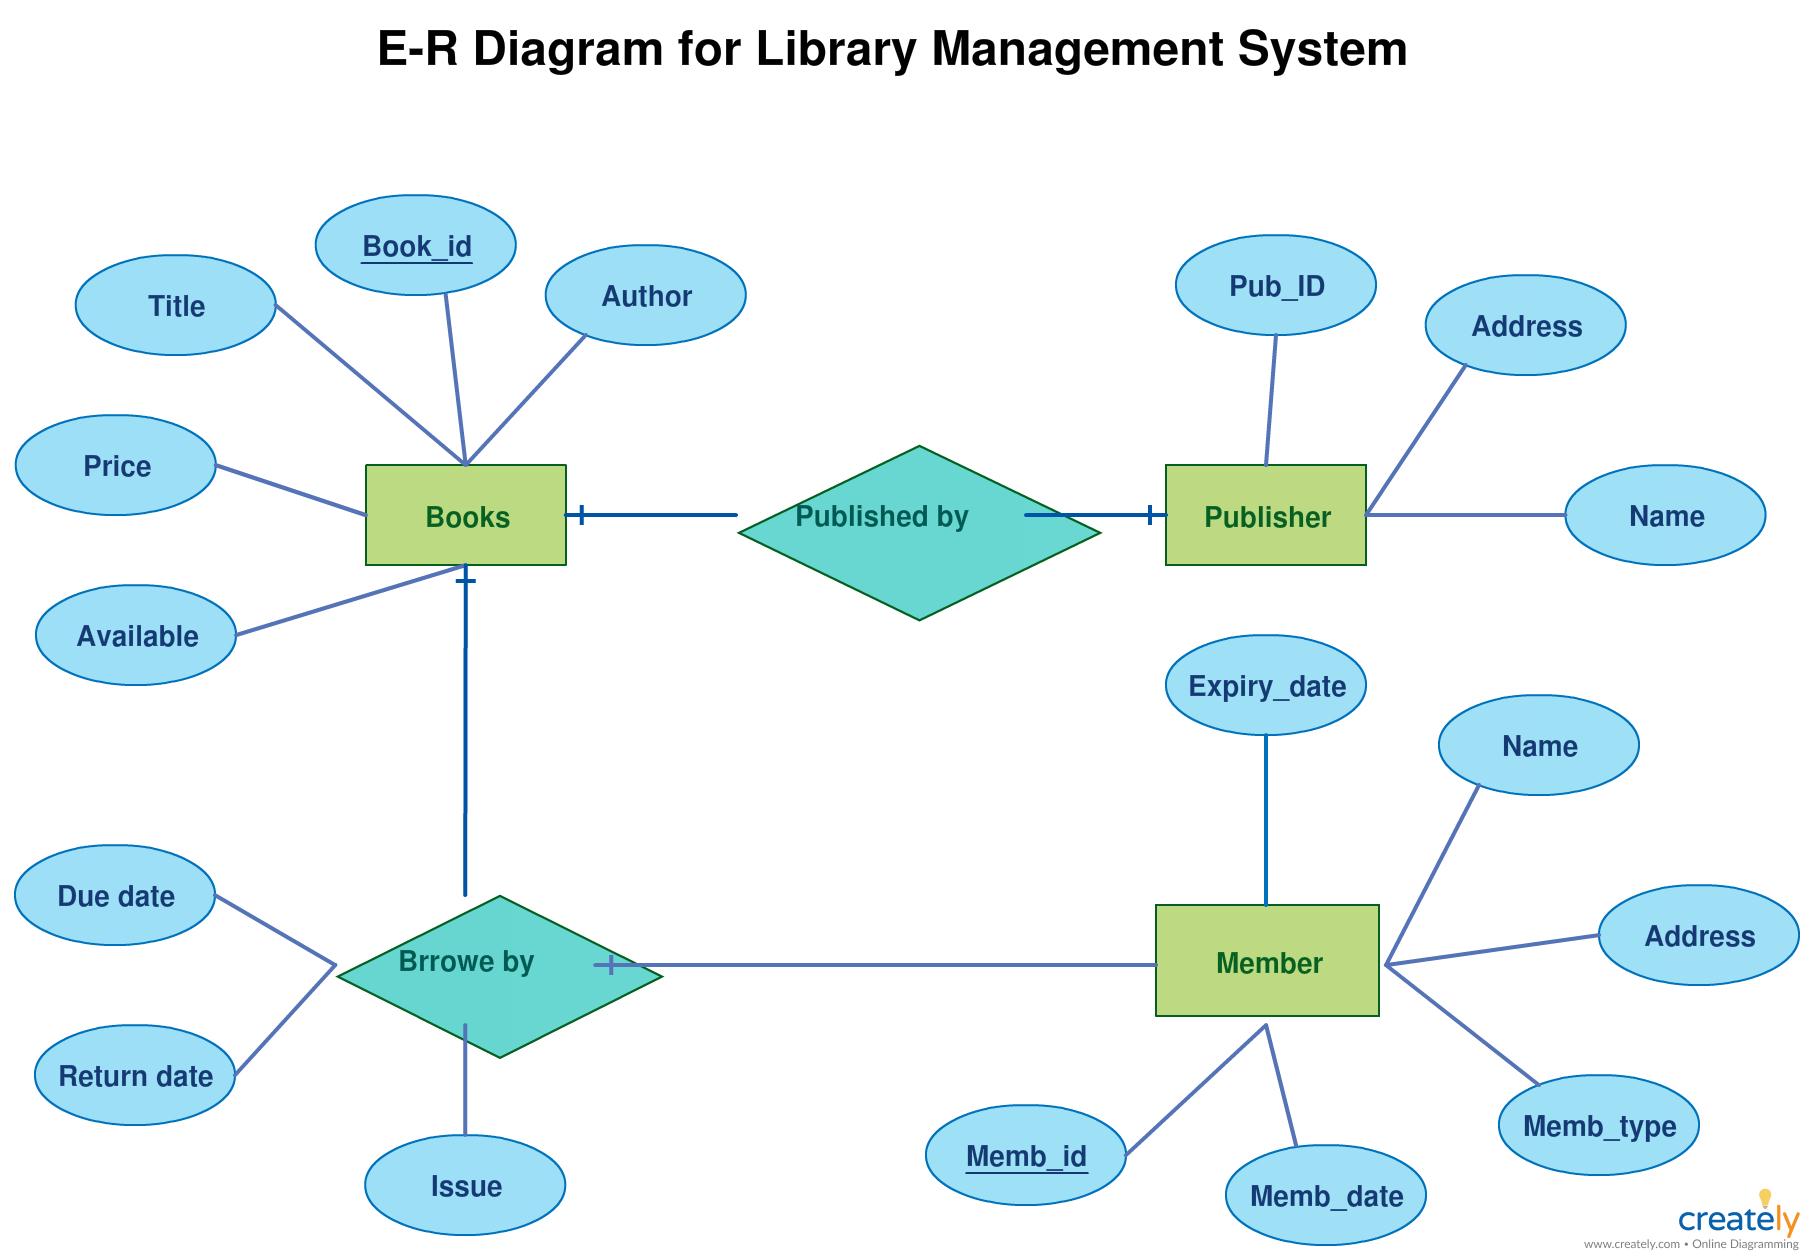 Er Diagram Tutorial | Data Flow Diagram, Diagram, Class Diagram intended for E Voting Er Diagram